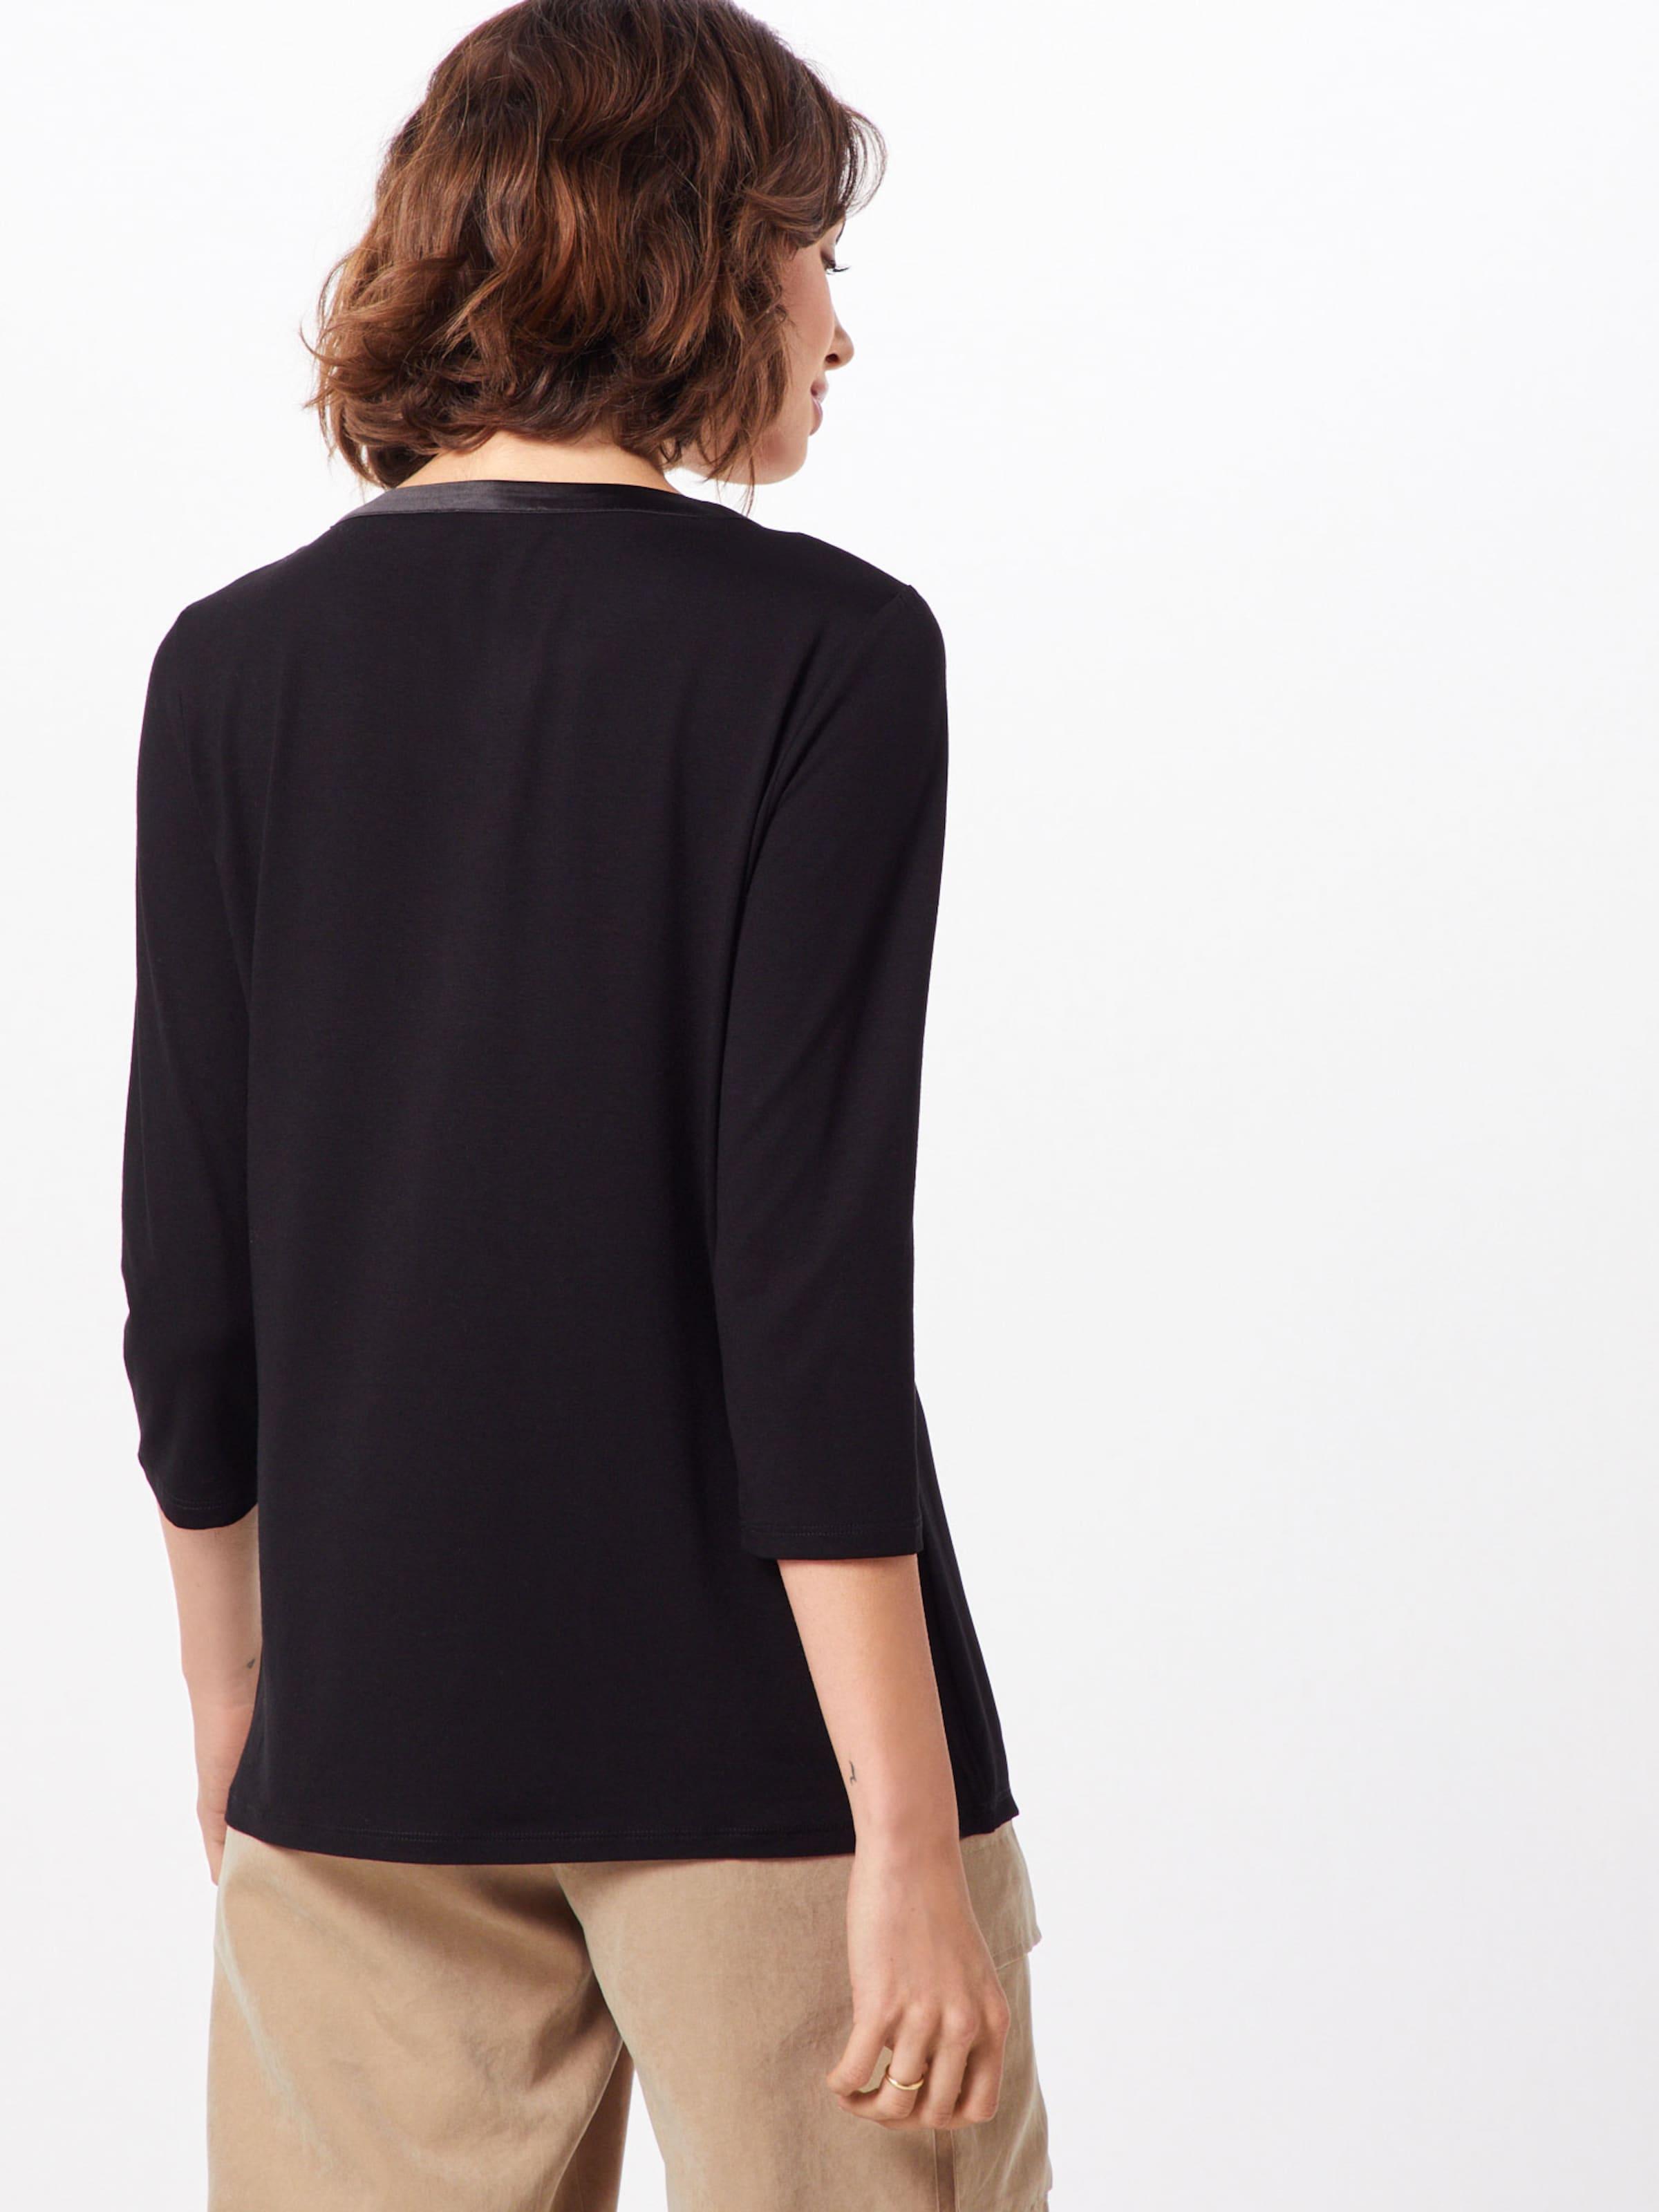 T shirt shirt T Noir En Comma Comma En shirt En Noir Comma T 0OwnkP